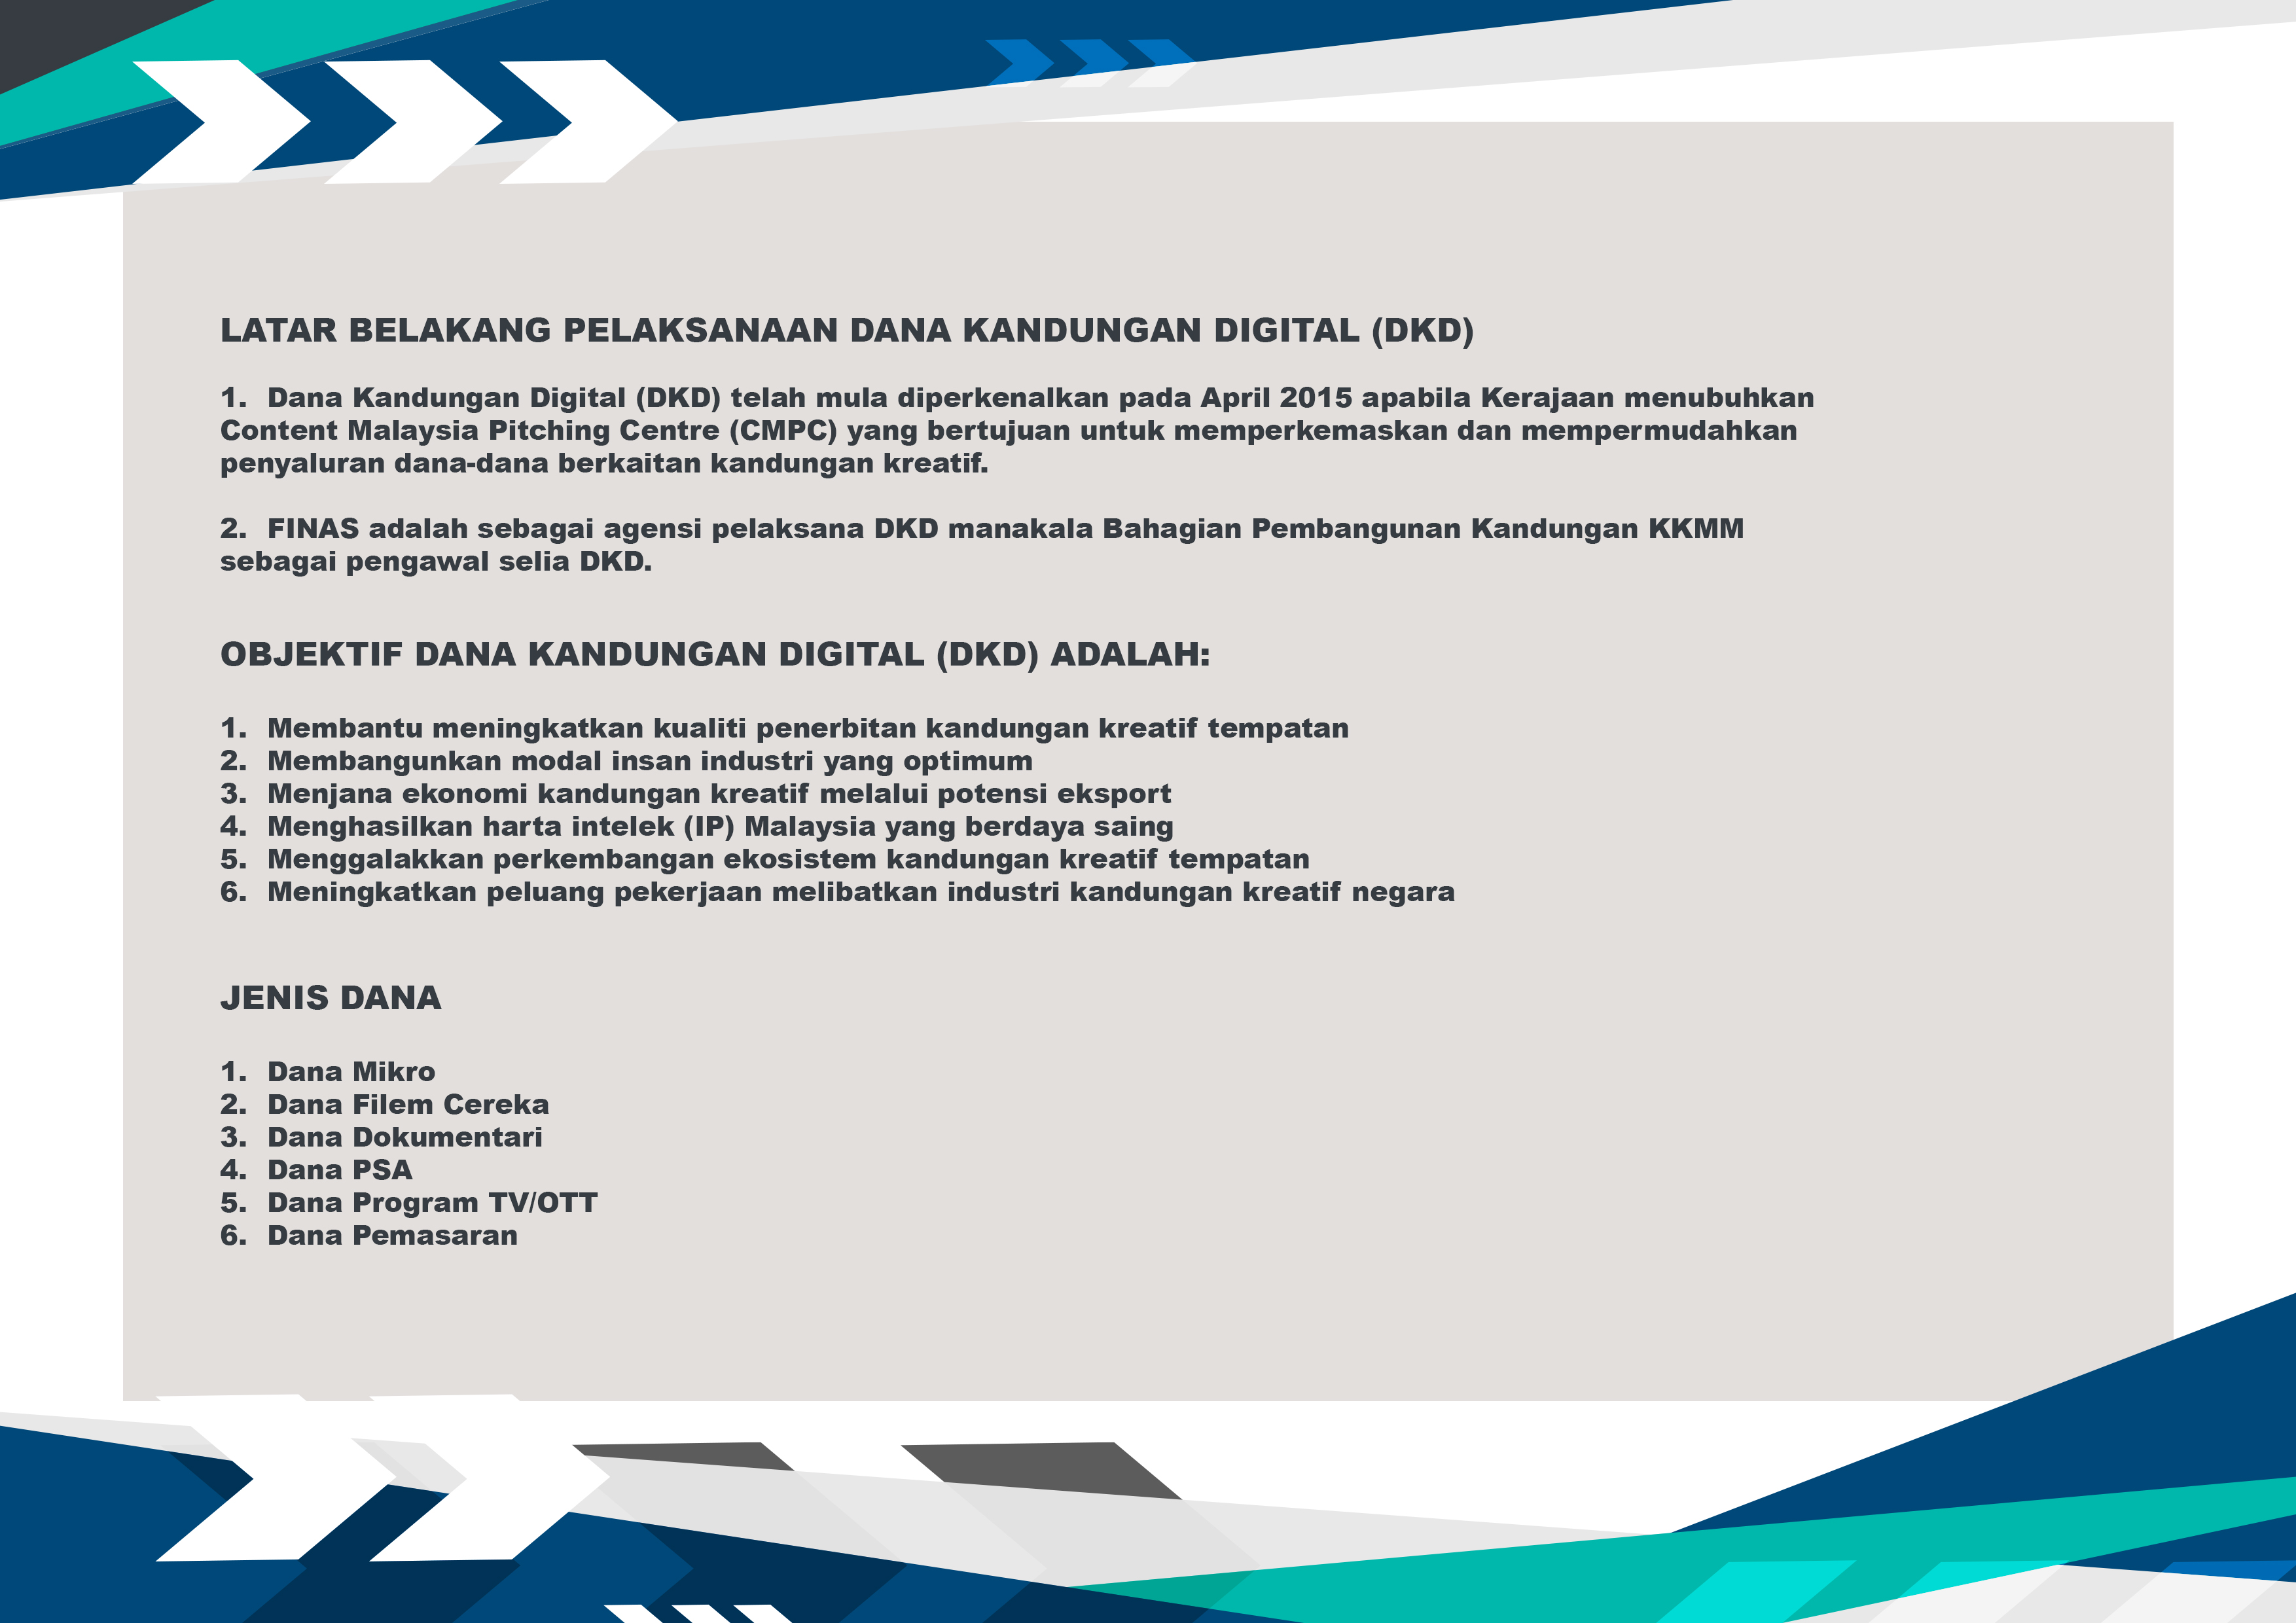 Poster DKD